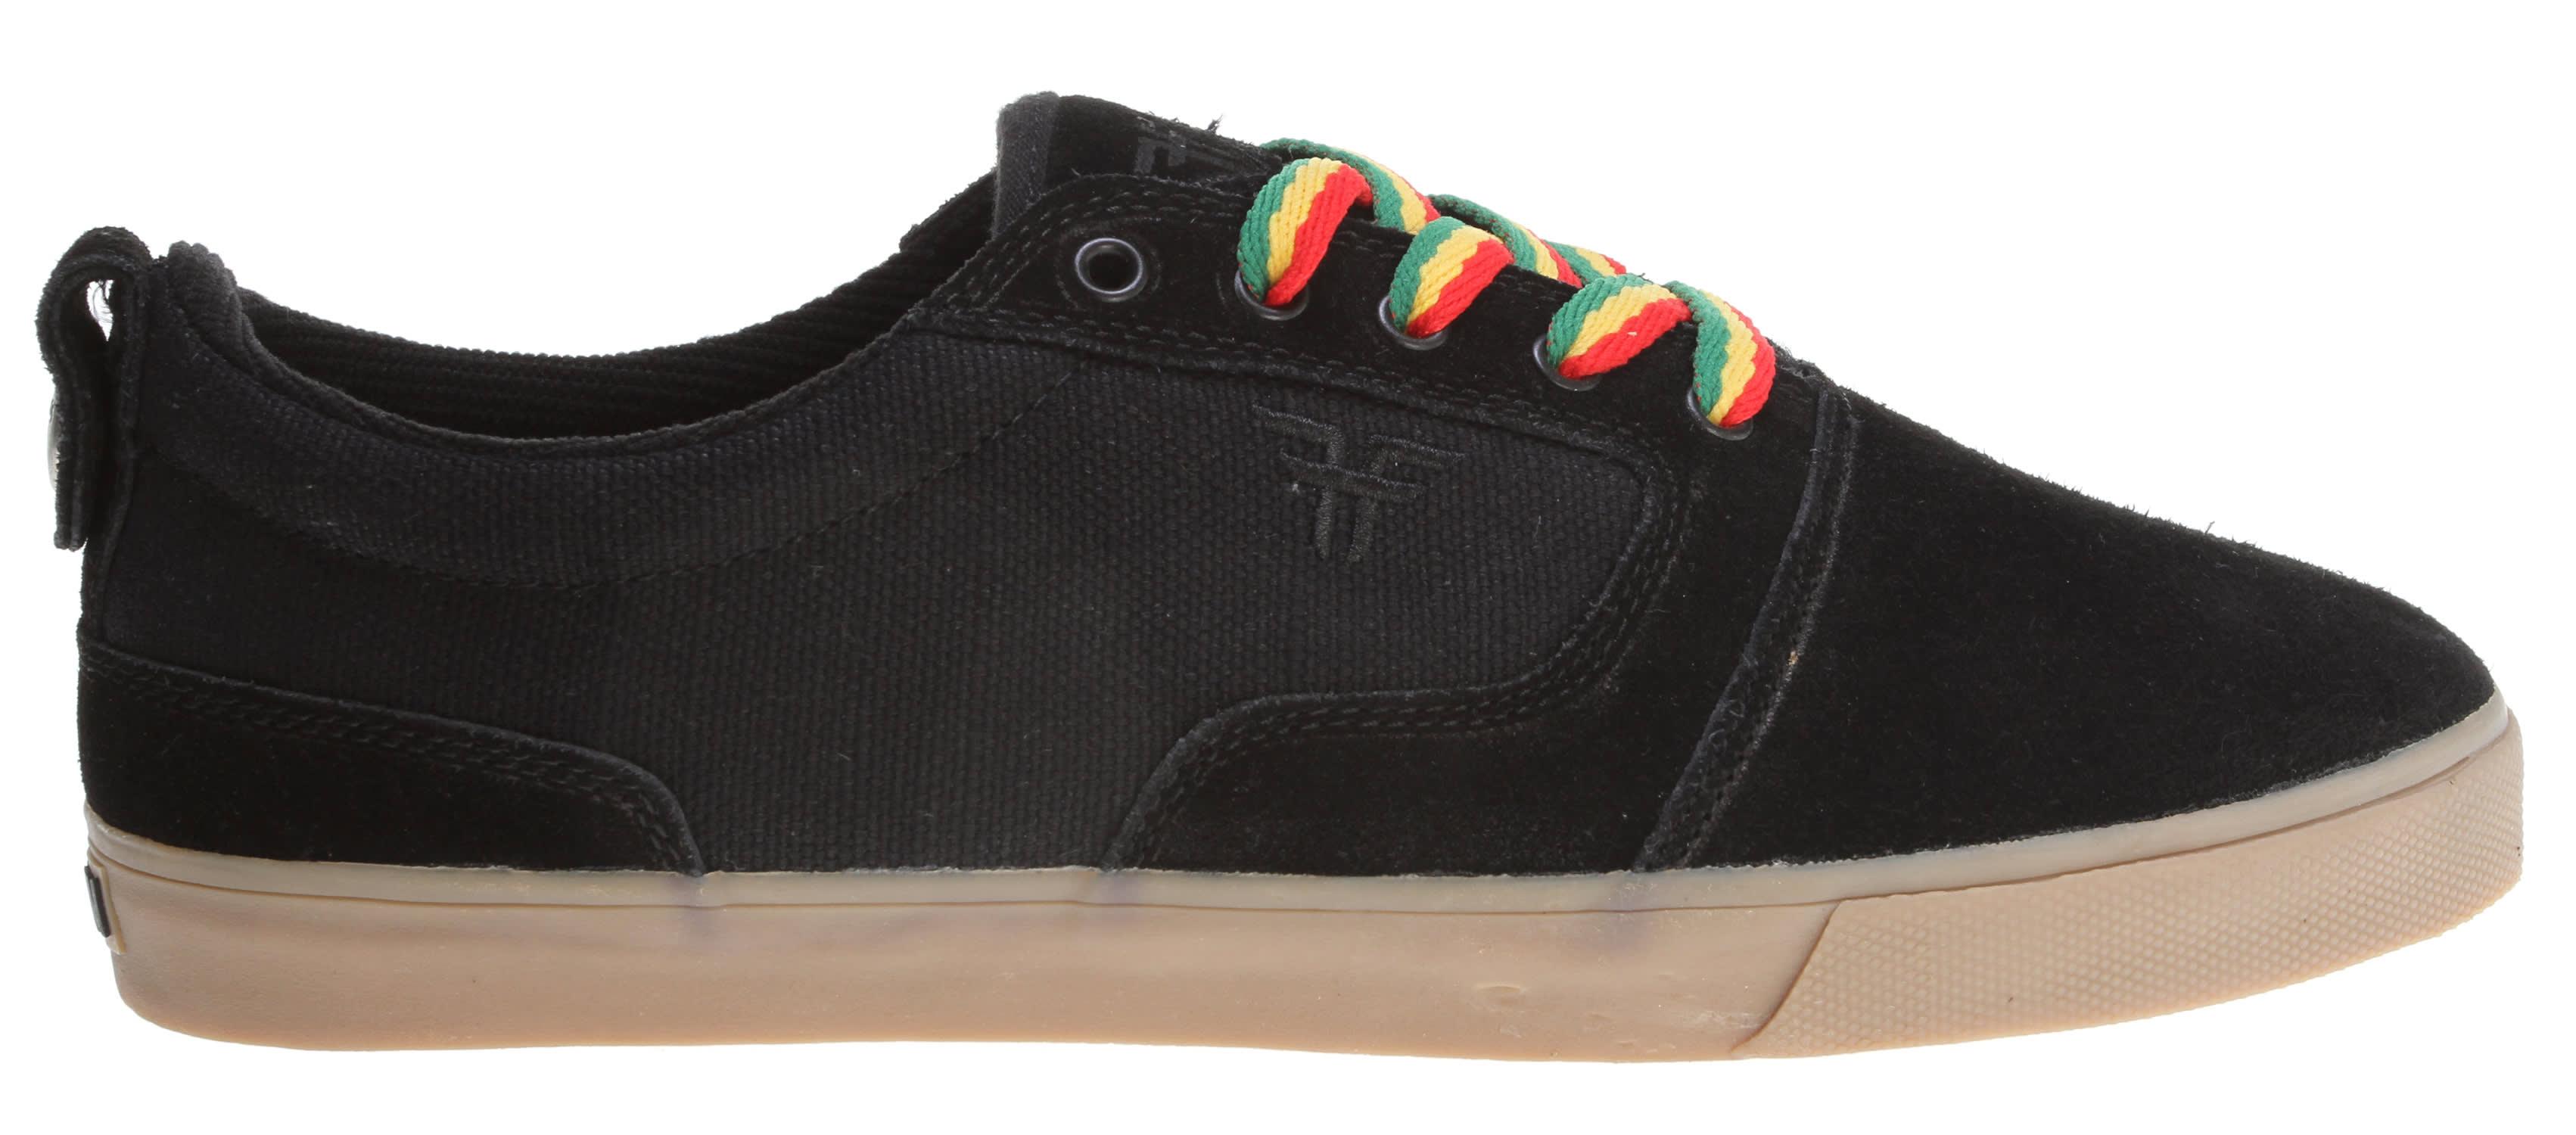 Skate shoes kingston - Fallen Kingston Skate Shoes Thumbnail 1